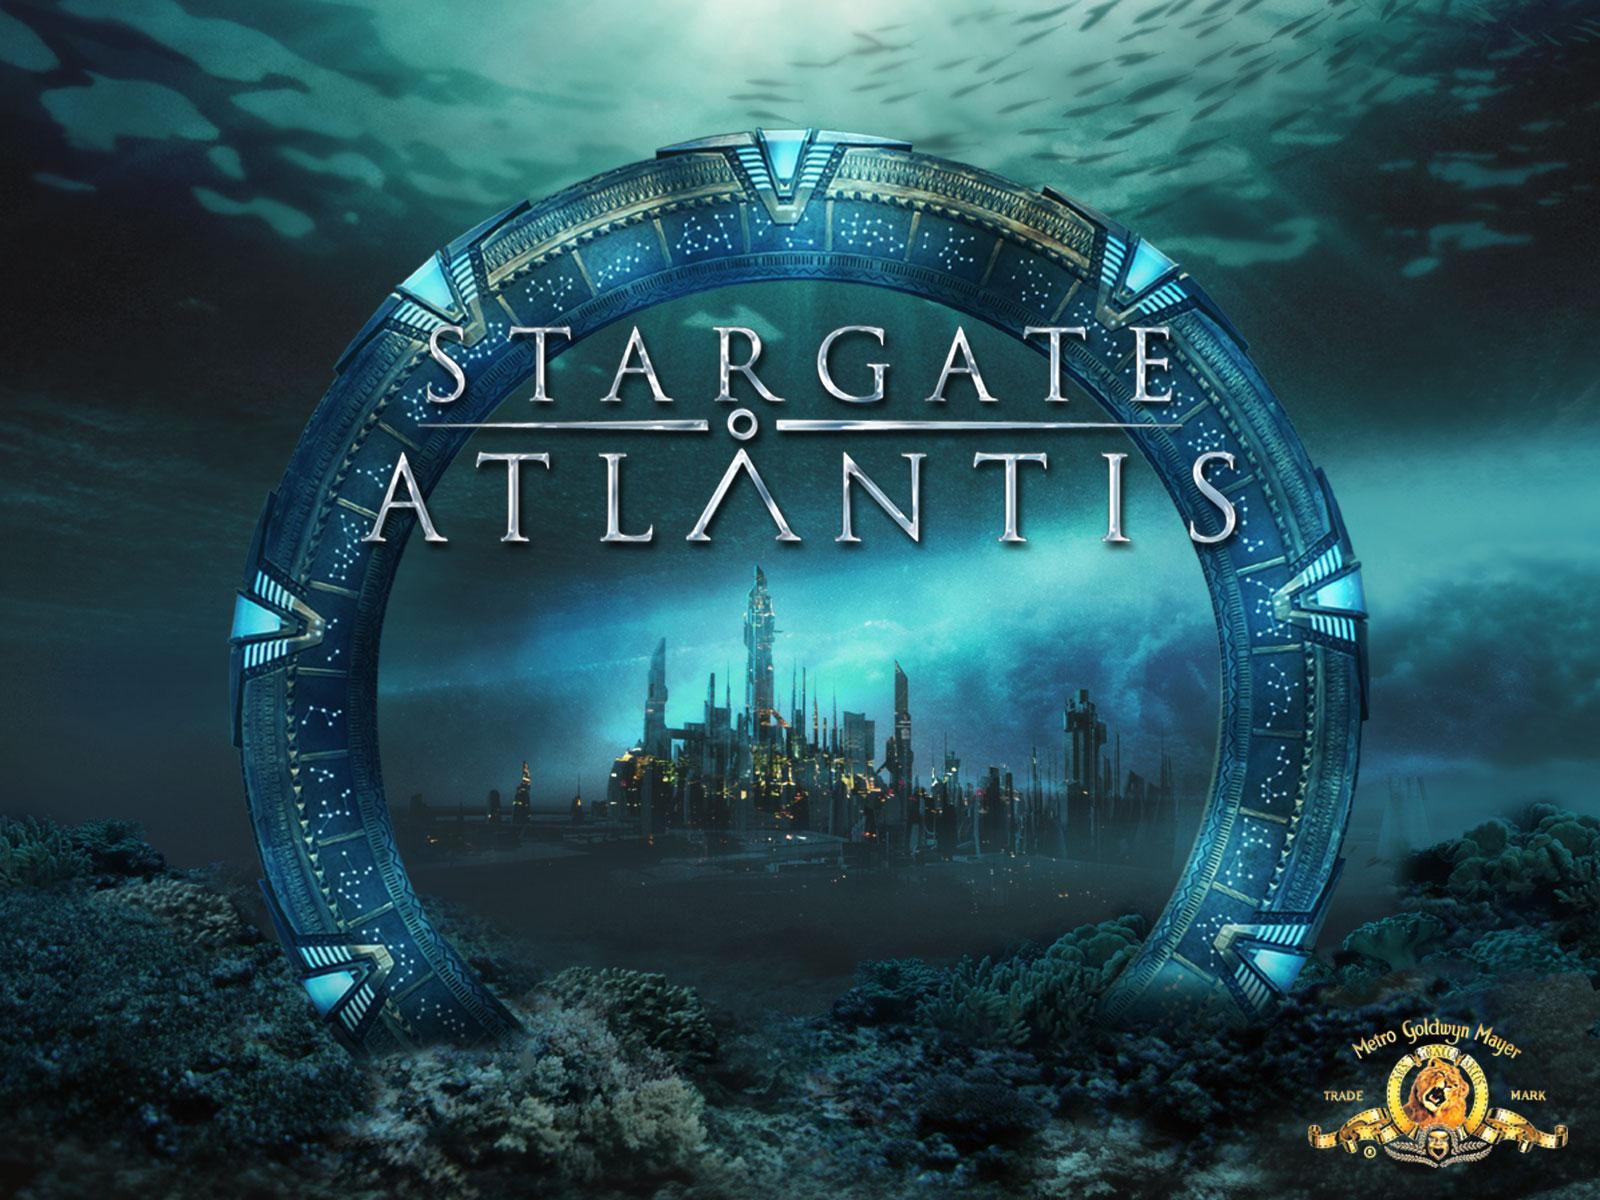 http://3.bp.blogspot.com/_uJleAiAZ8HU/S_nkWMIAtII/AAAAAAAAAdQ/_DafnU-dlpA/s1600/Wallpapers+2992-61-Stargate-Atlantis.jpg